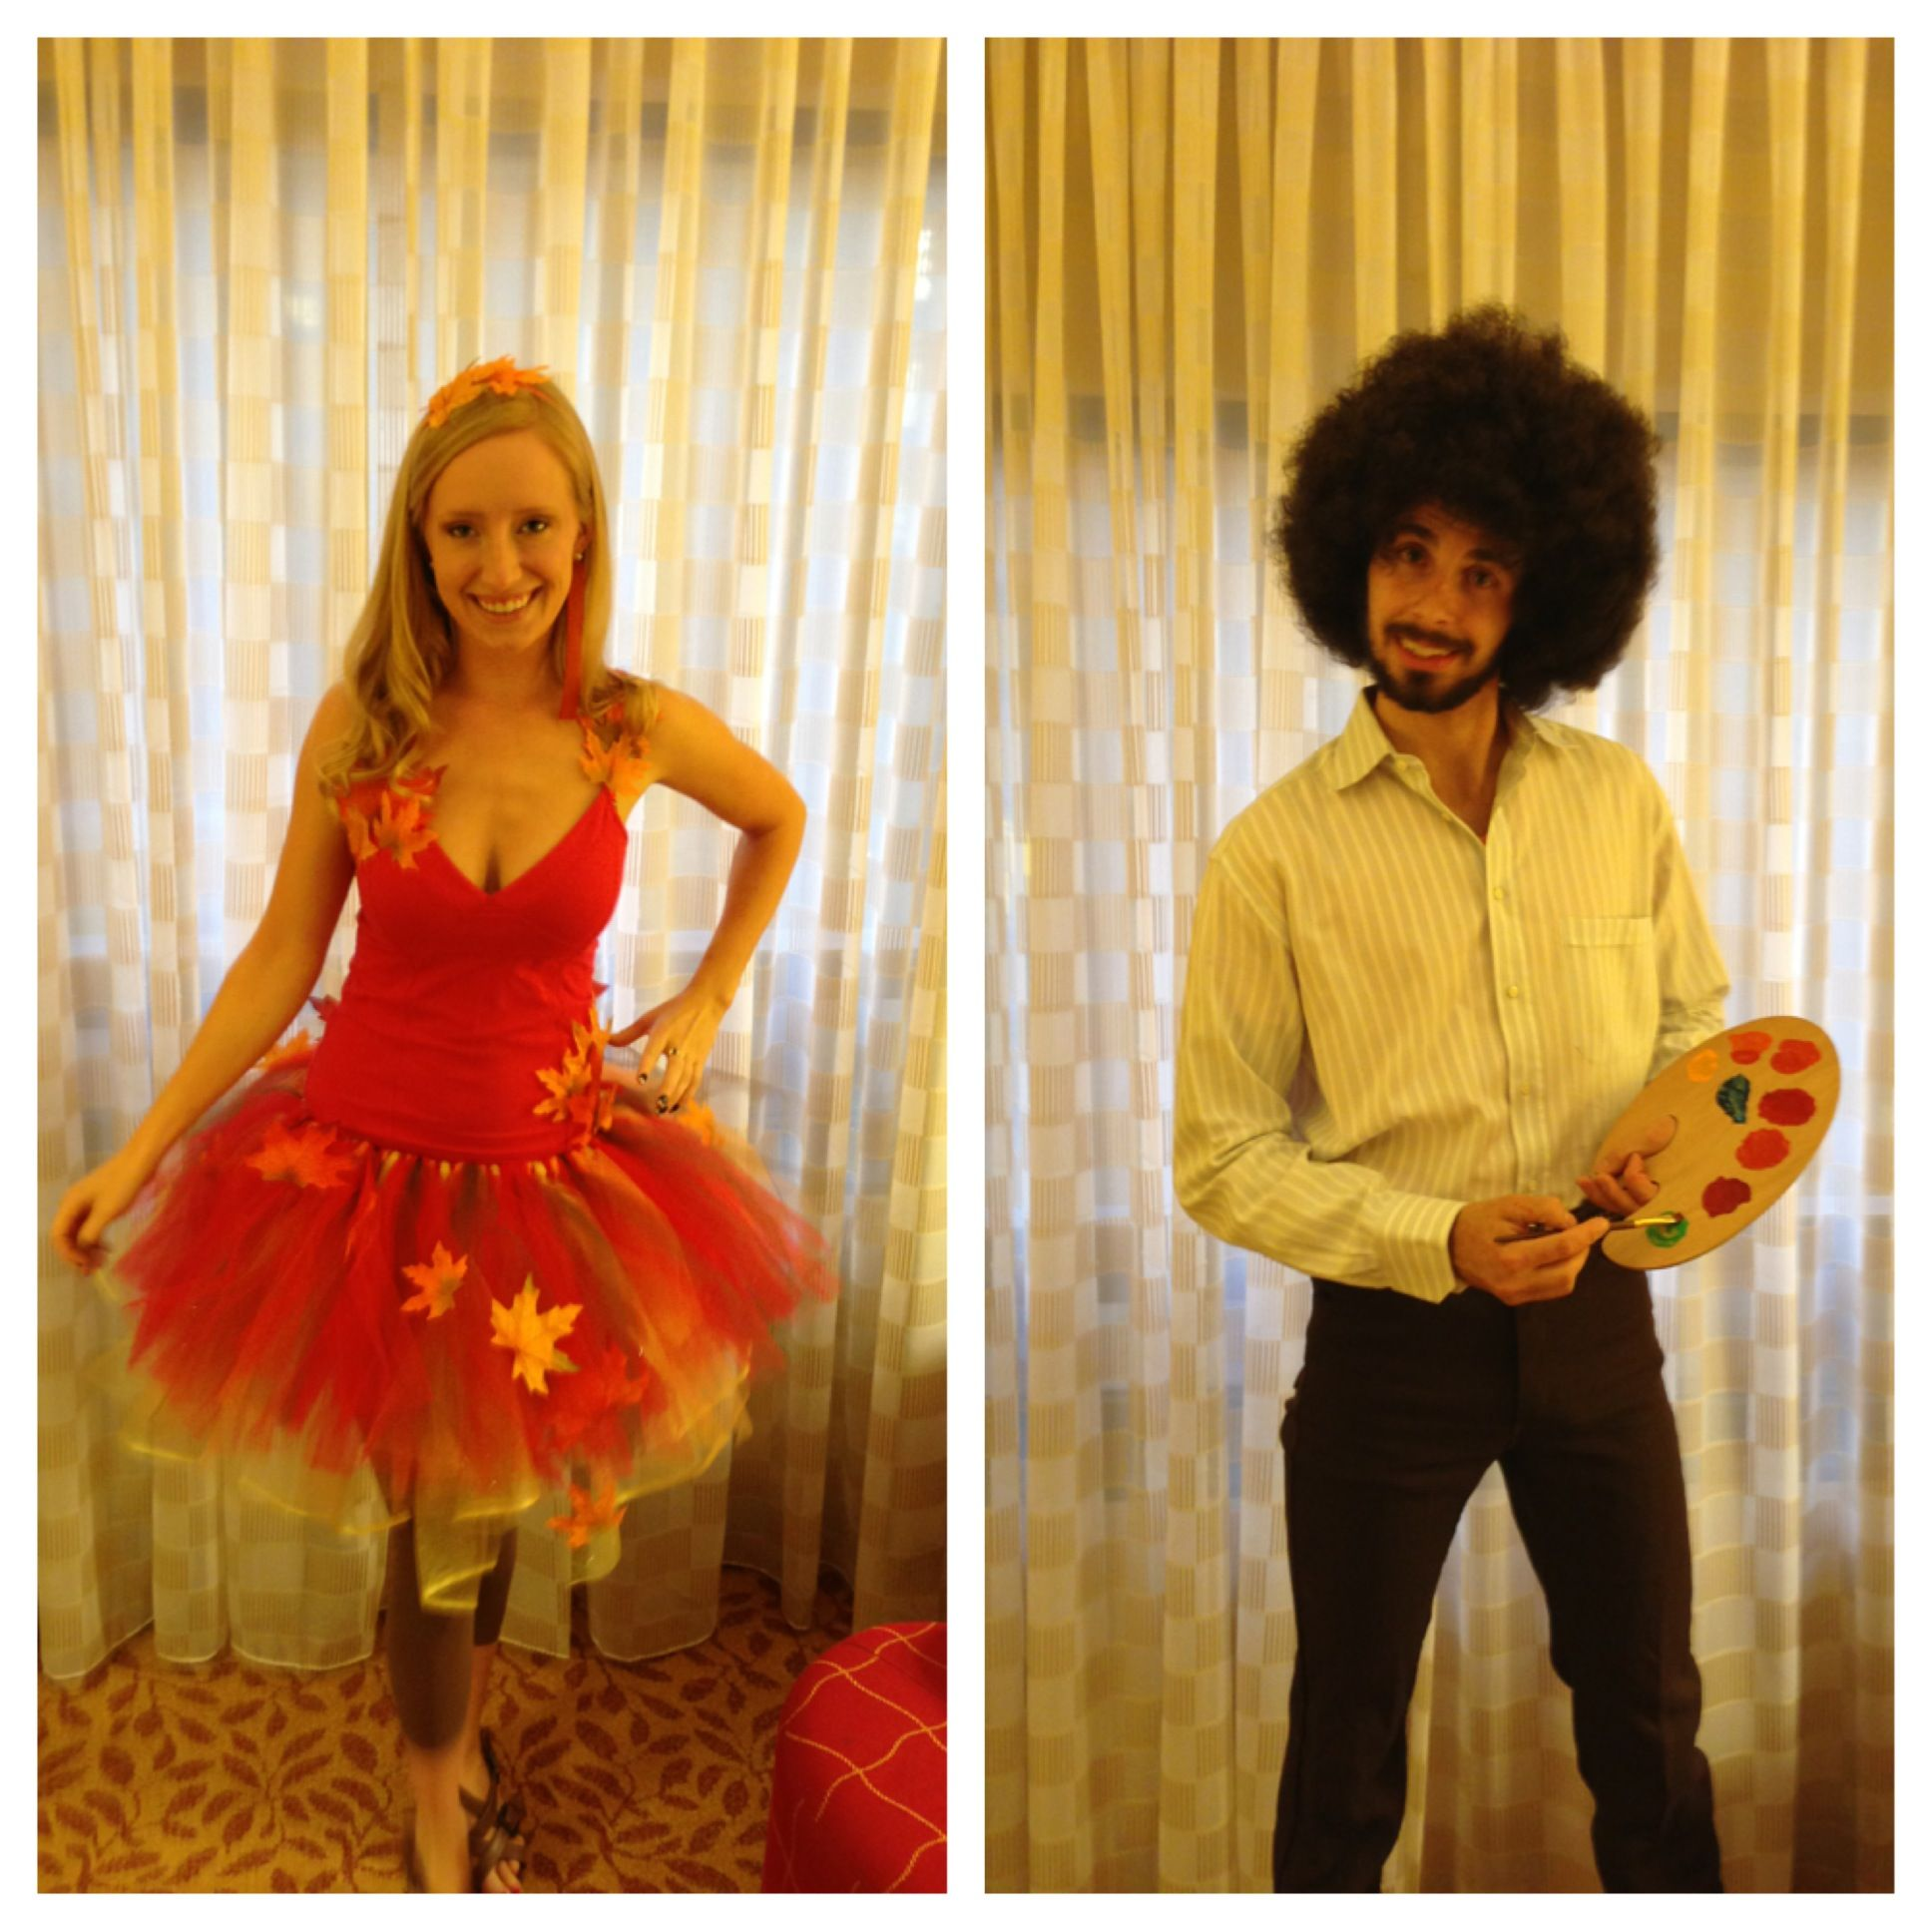 Bob Ross & Happy Little Tree Halloween Costume DIY Costume Couples ...